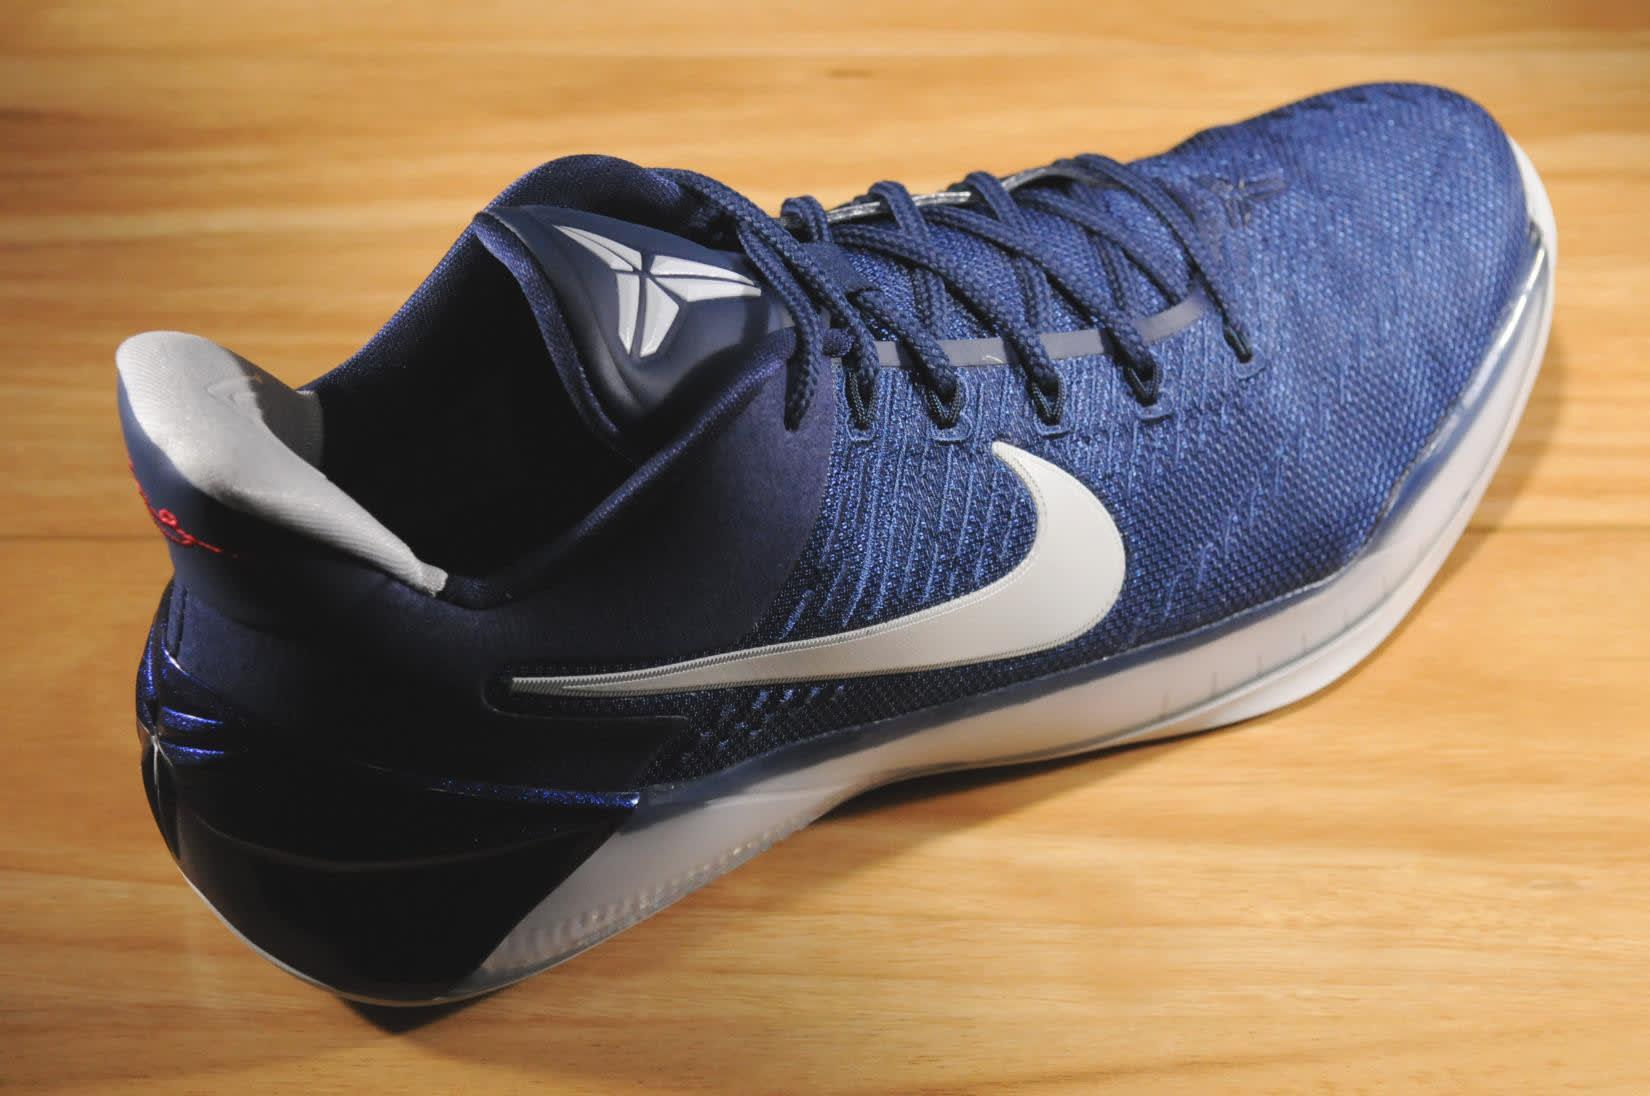 quality design 35577 13cef ... Nike Kobe AD Midnight Navy Heel 852425-406 ...